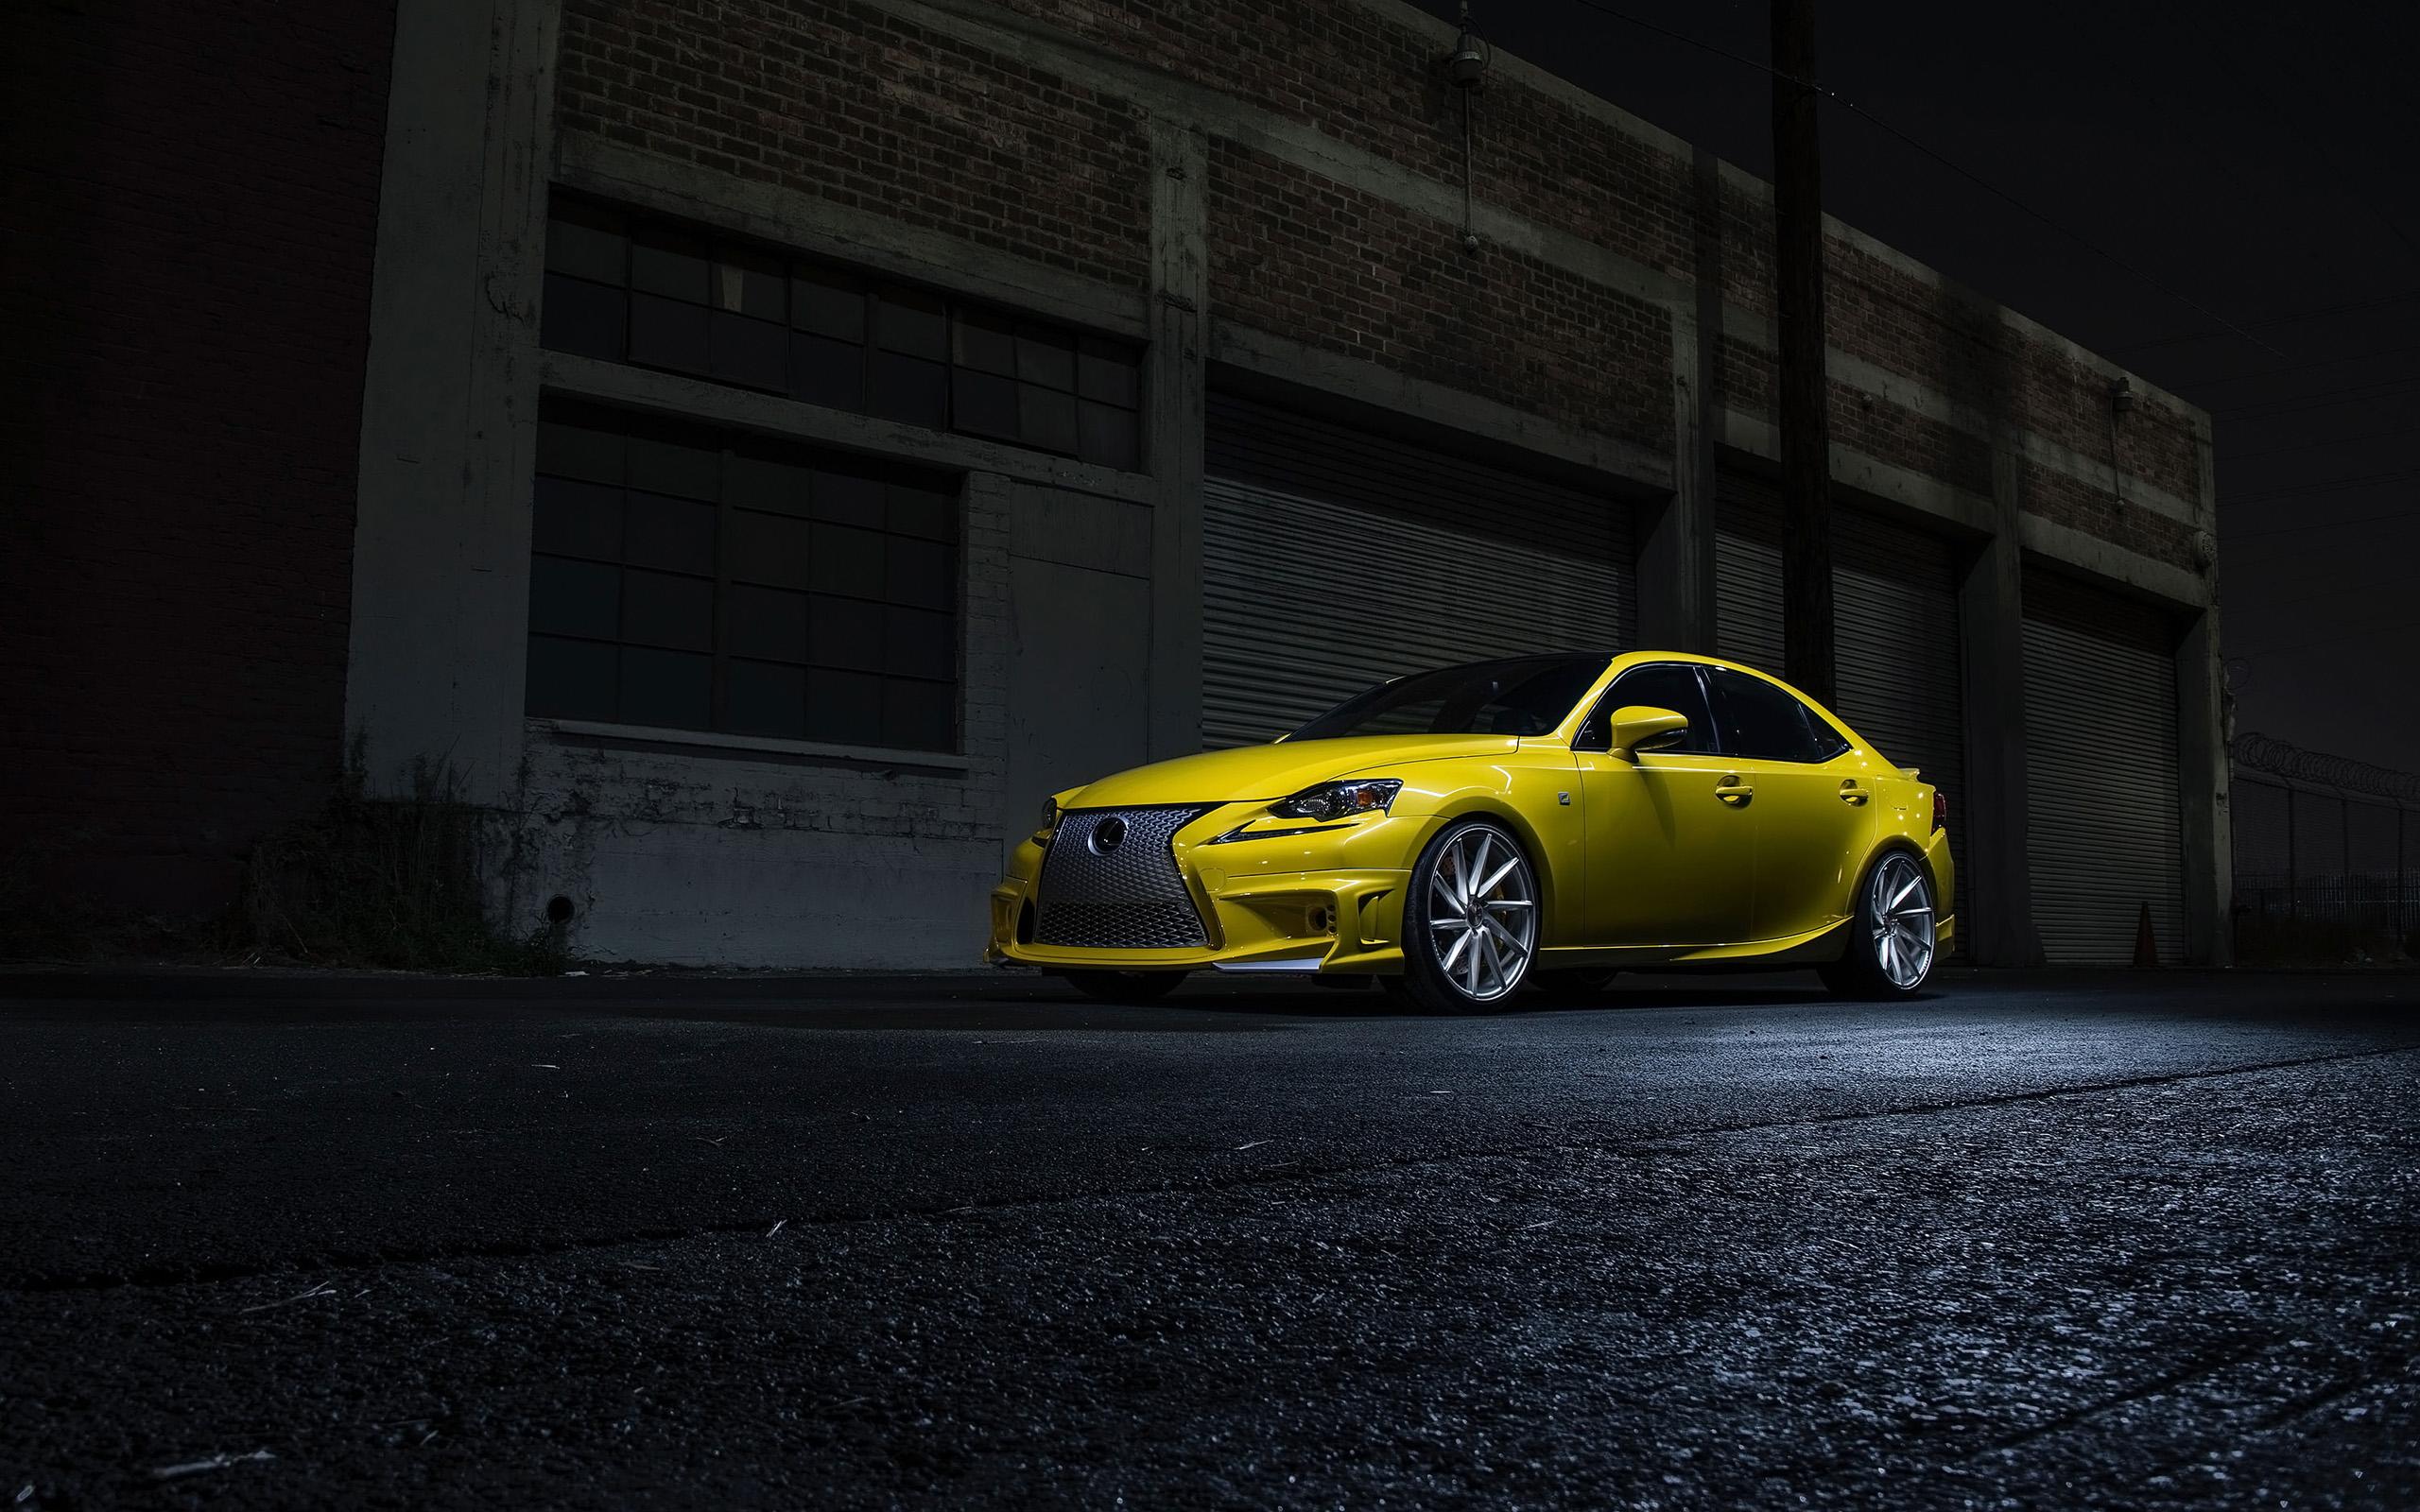 2014 lexus is 350 f sport by vossen wheels wallpaper hd car wallpapers id 4159. Black Bedroom Furniture Sets. Home Design Ideas